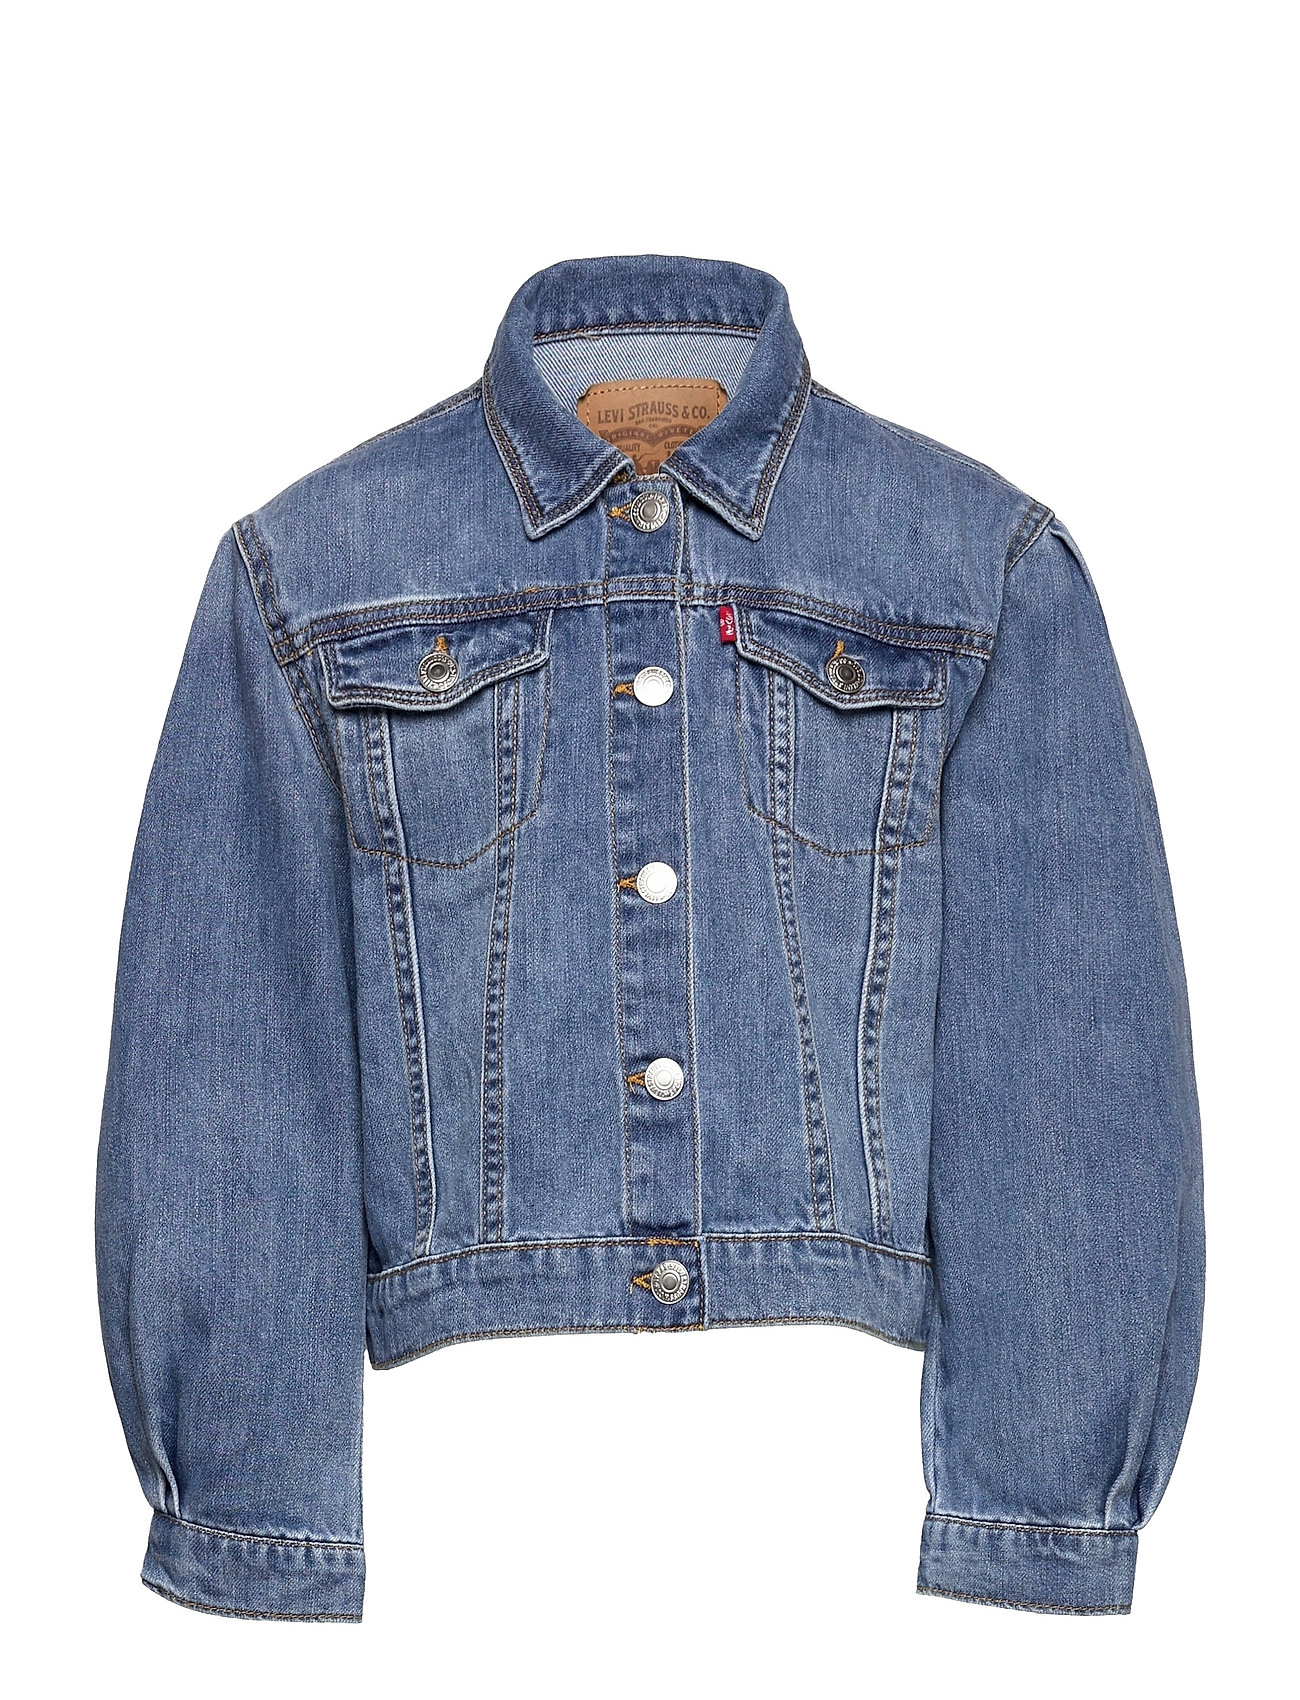 Lvg Over D Pleat Slv Truckr Outerwear Jackets & Coats Denim & Corduroy Blå Levi's